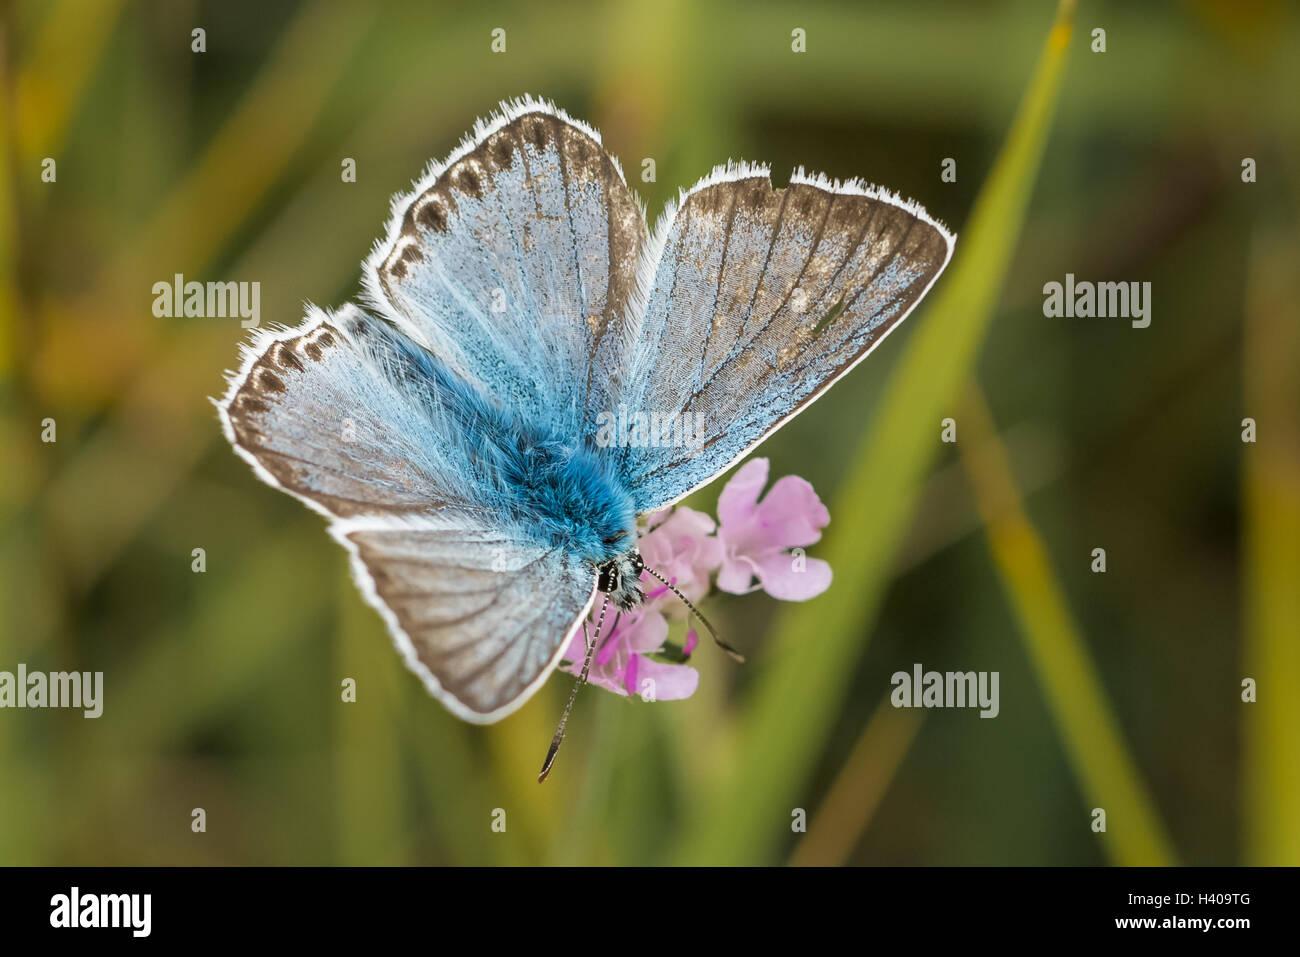 Männliche Chalkhill Blue Butterfly (Polyommatus / Lysandra Coridon) auf kleine Witwenblume Blüte Stockbild